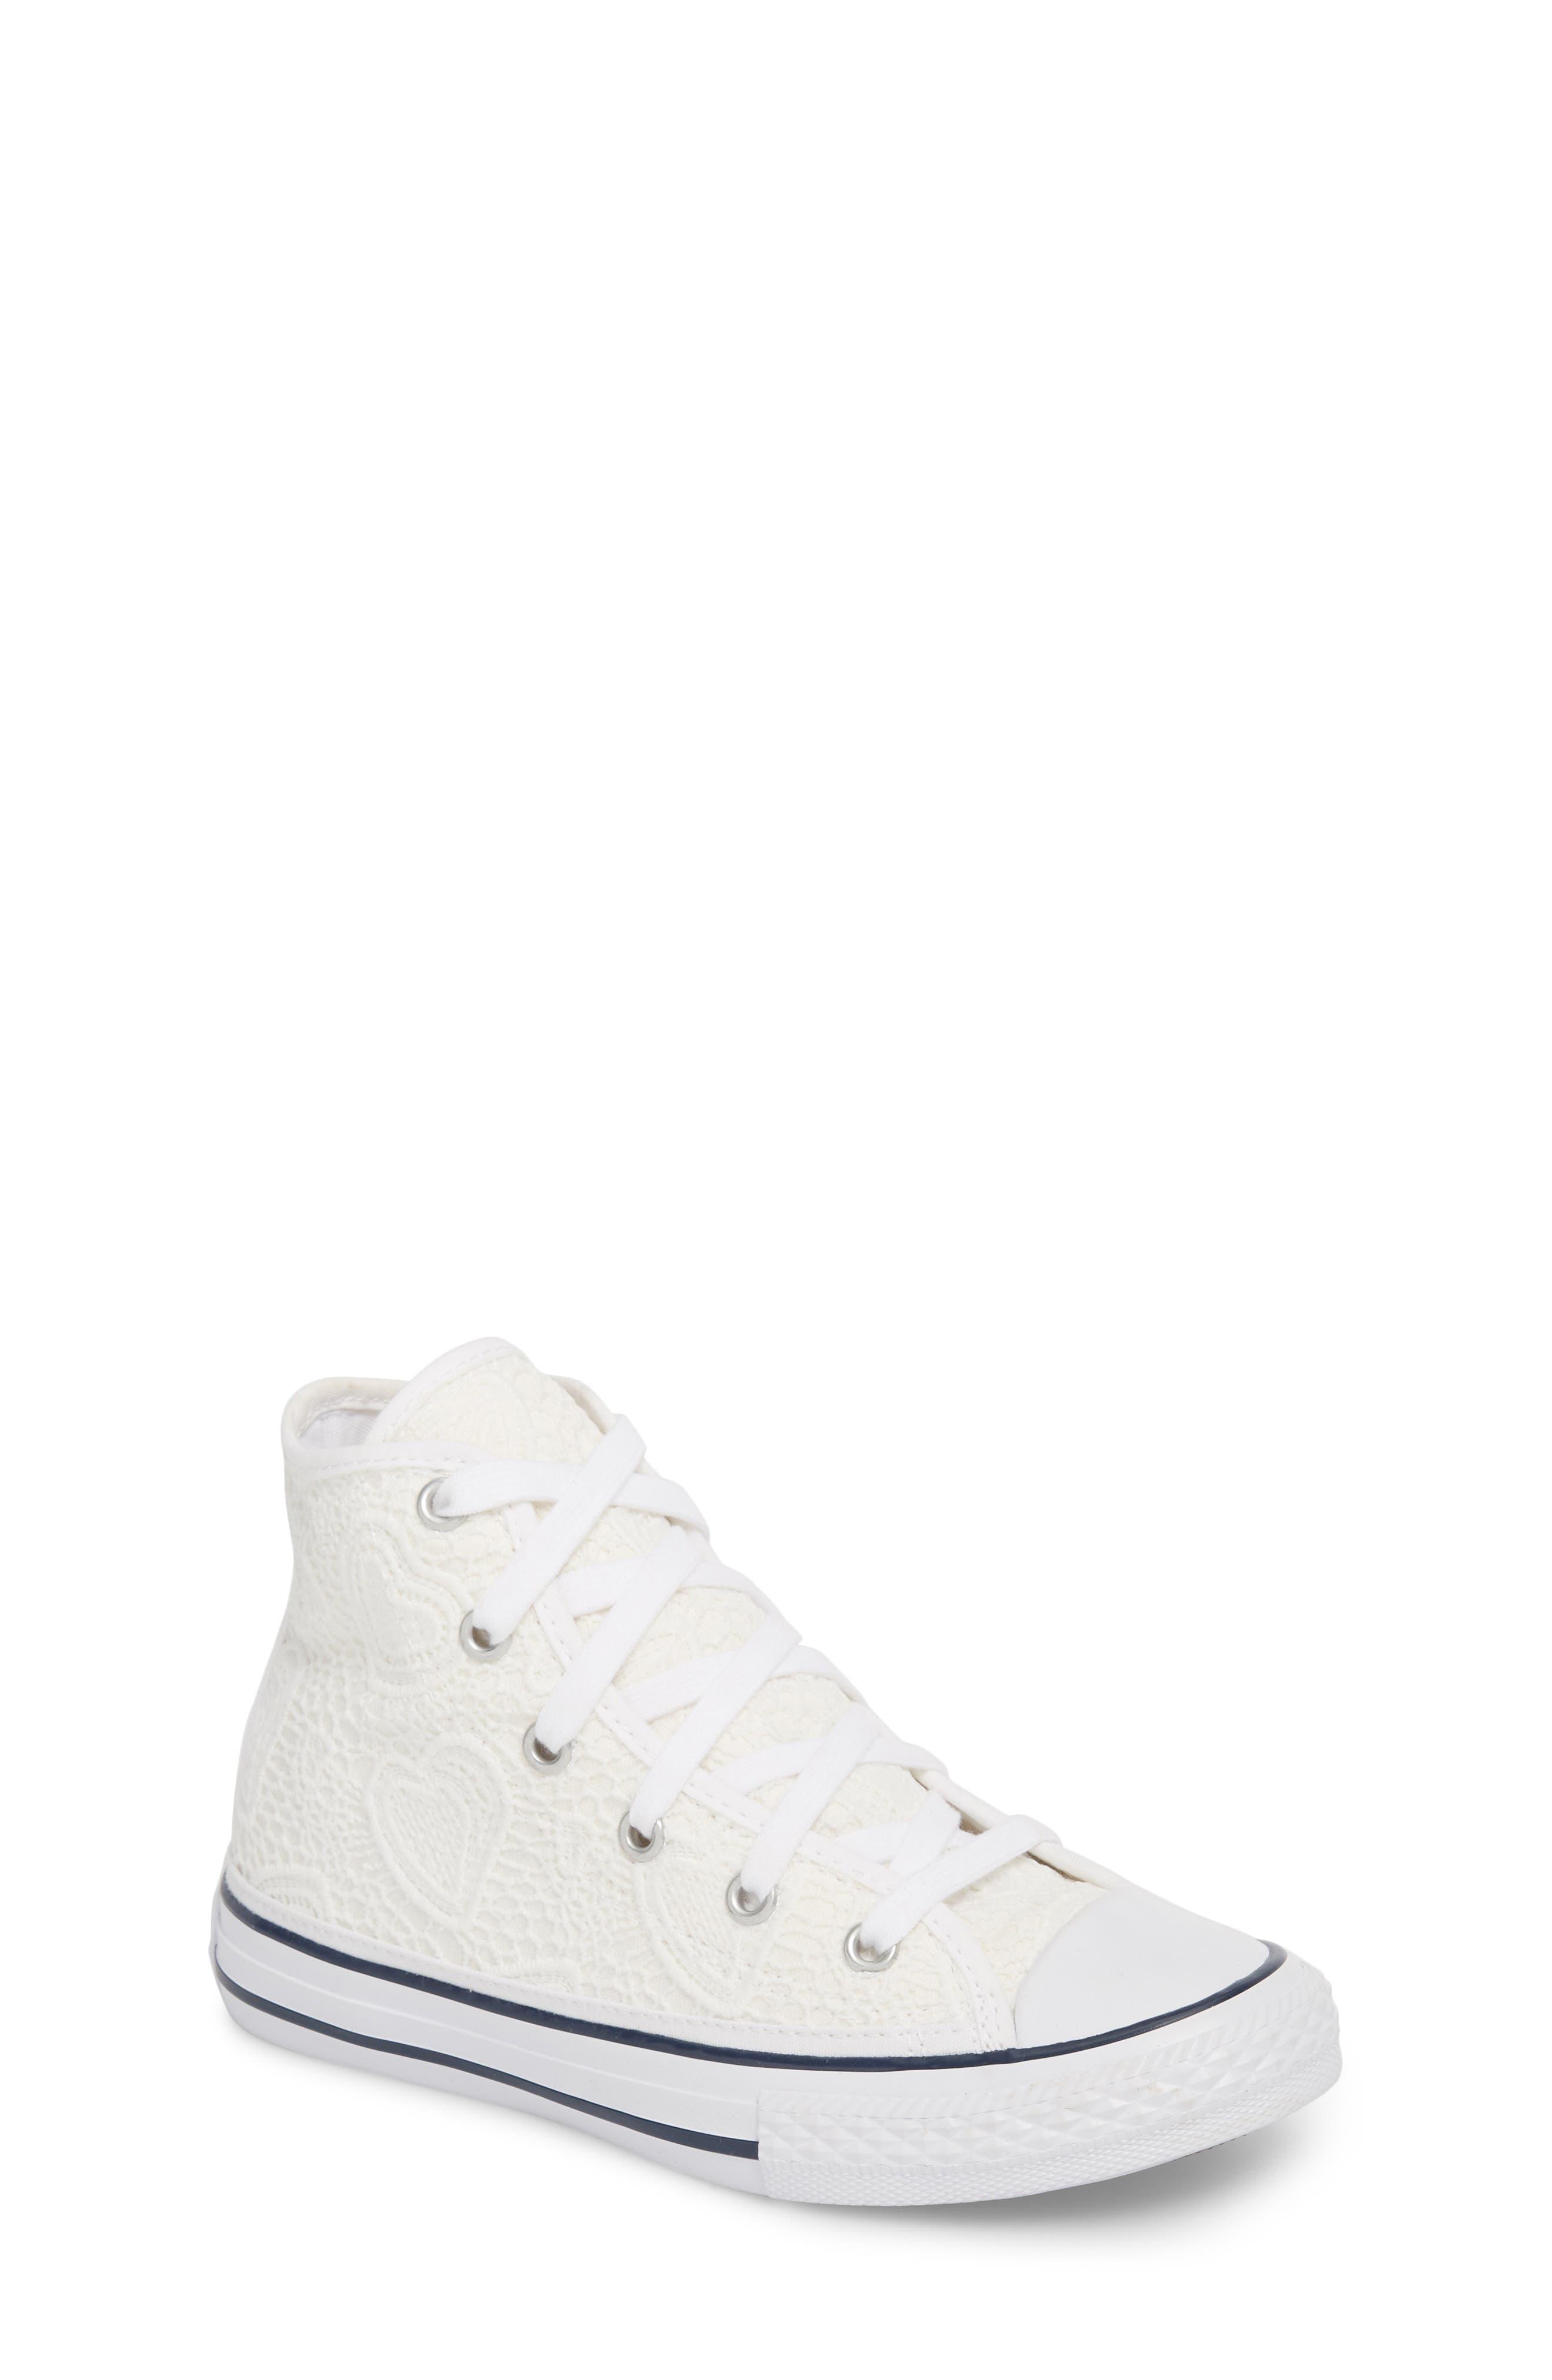 Chuck Taylor<sup>®</sup> All Star<sup>®</sup> Crochet High Top Sneaker,                             Main thumbnail 1, color,                             102